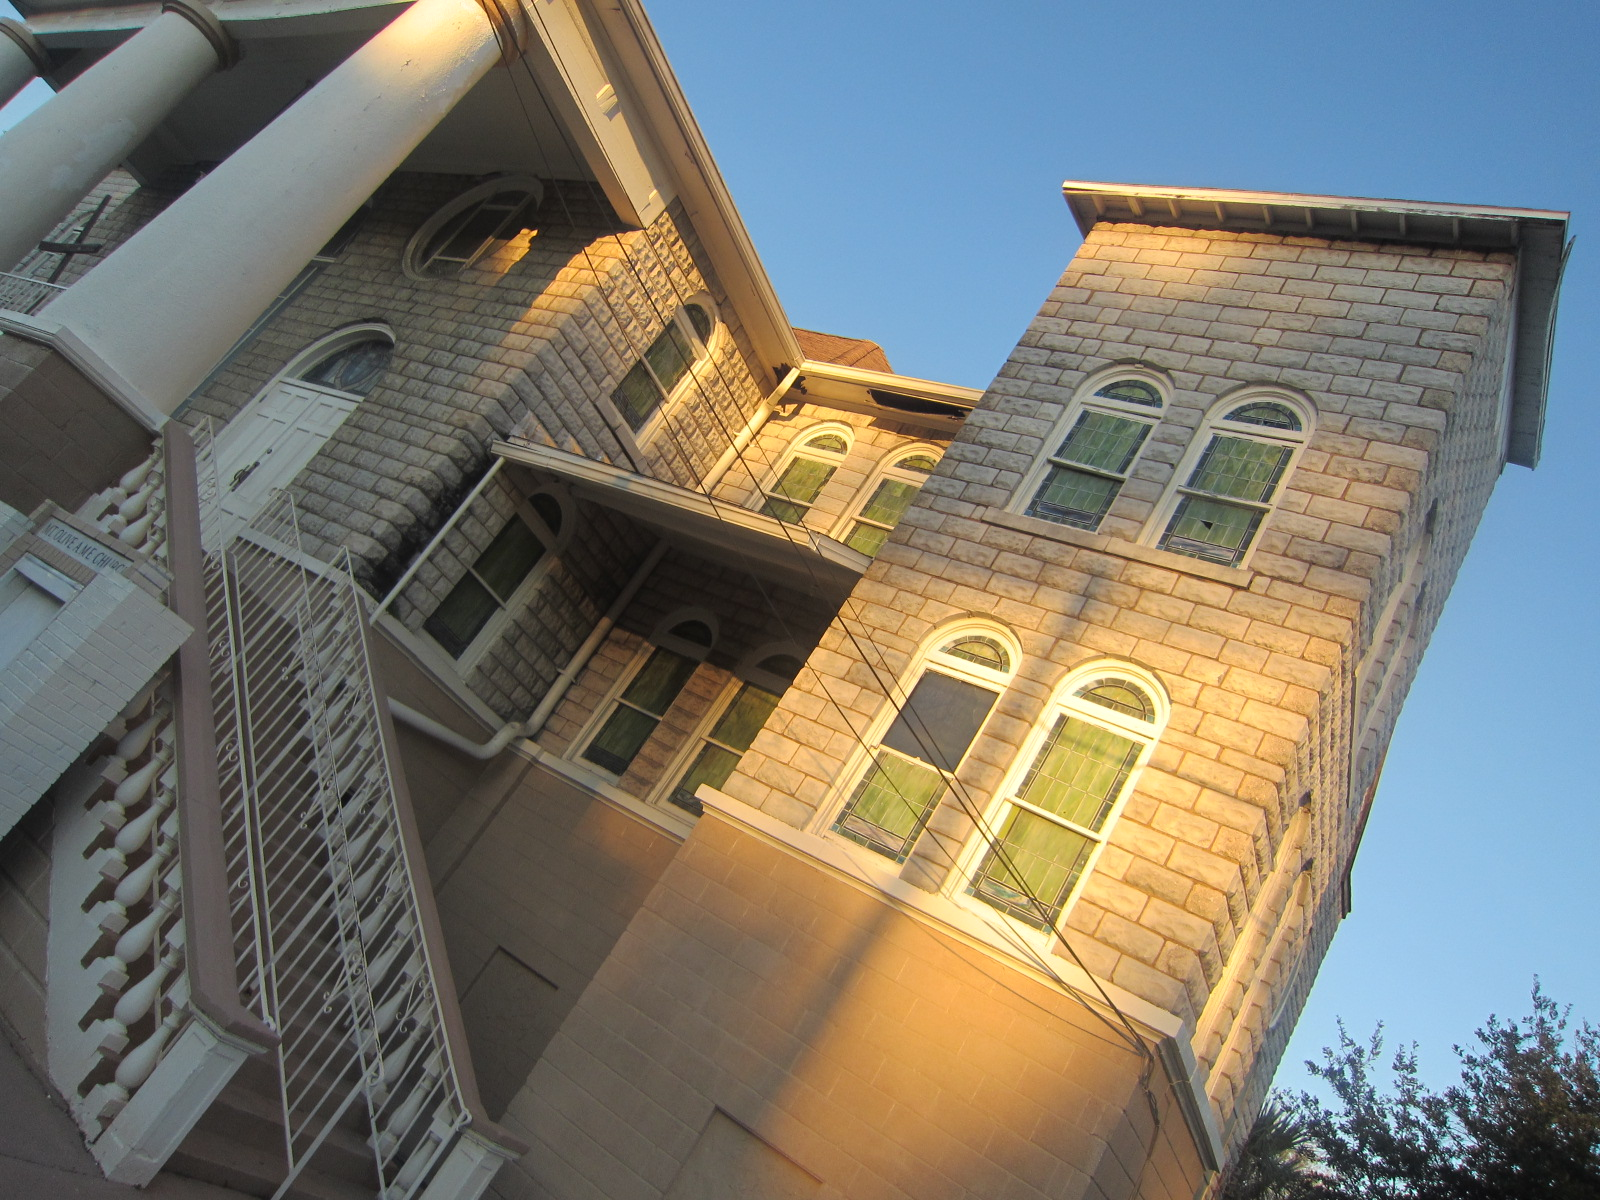 Fairfield Mount Olive A M E Church